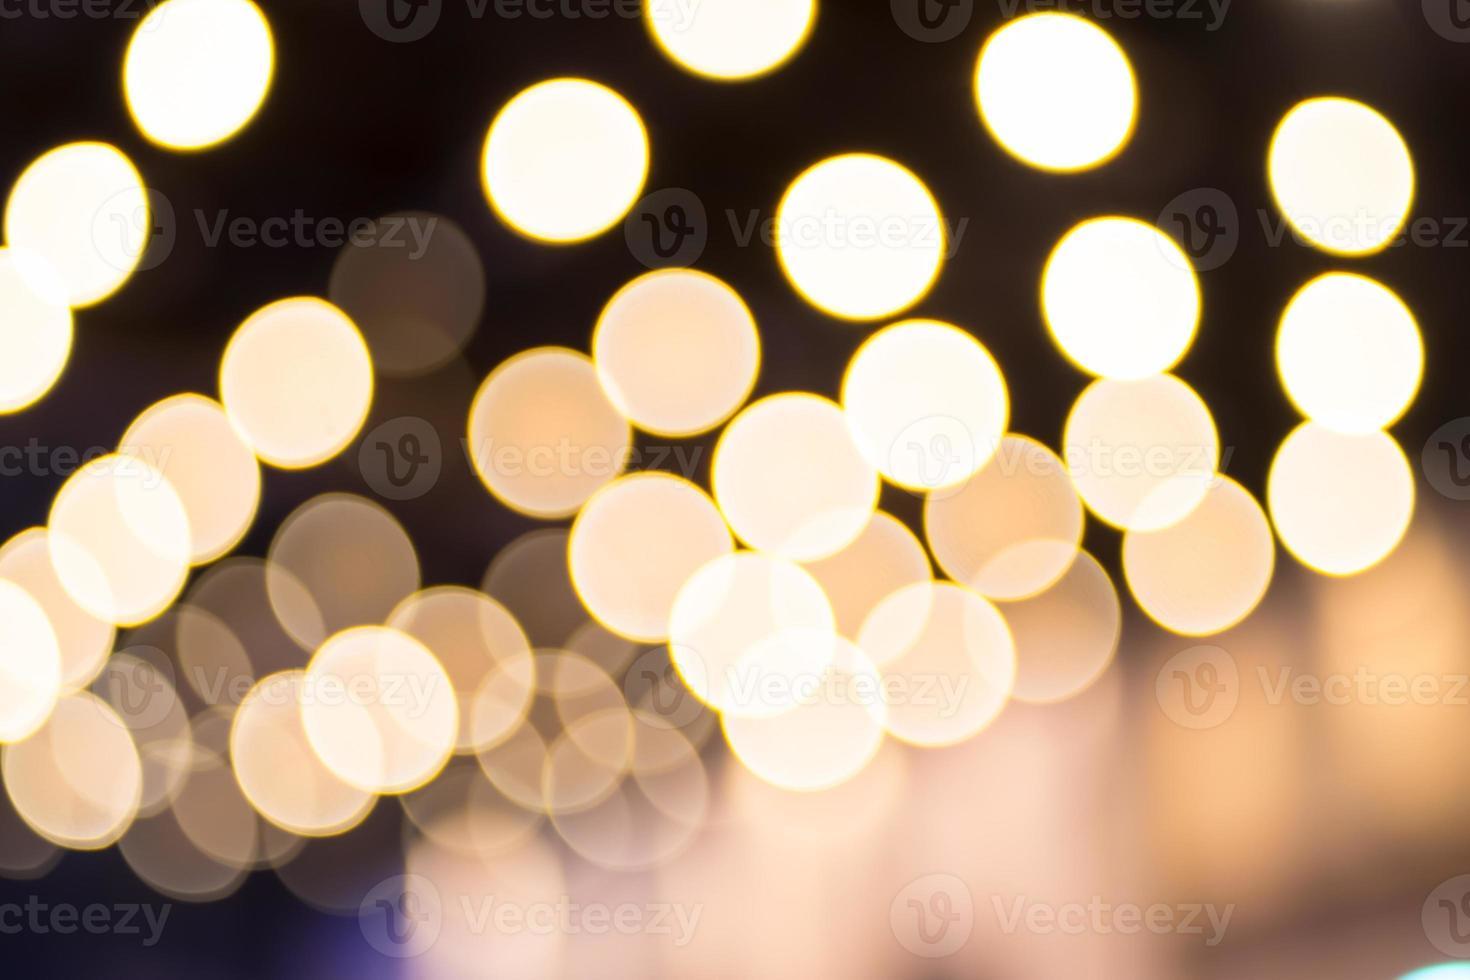 oskärpa bakgrund: abstrakt cricle bokeh-belysning, bakgrundsstruktur foto